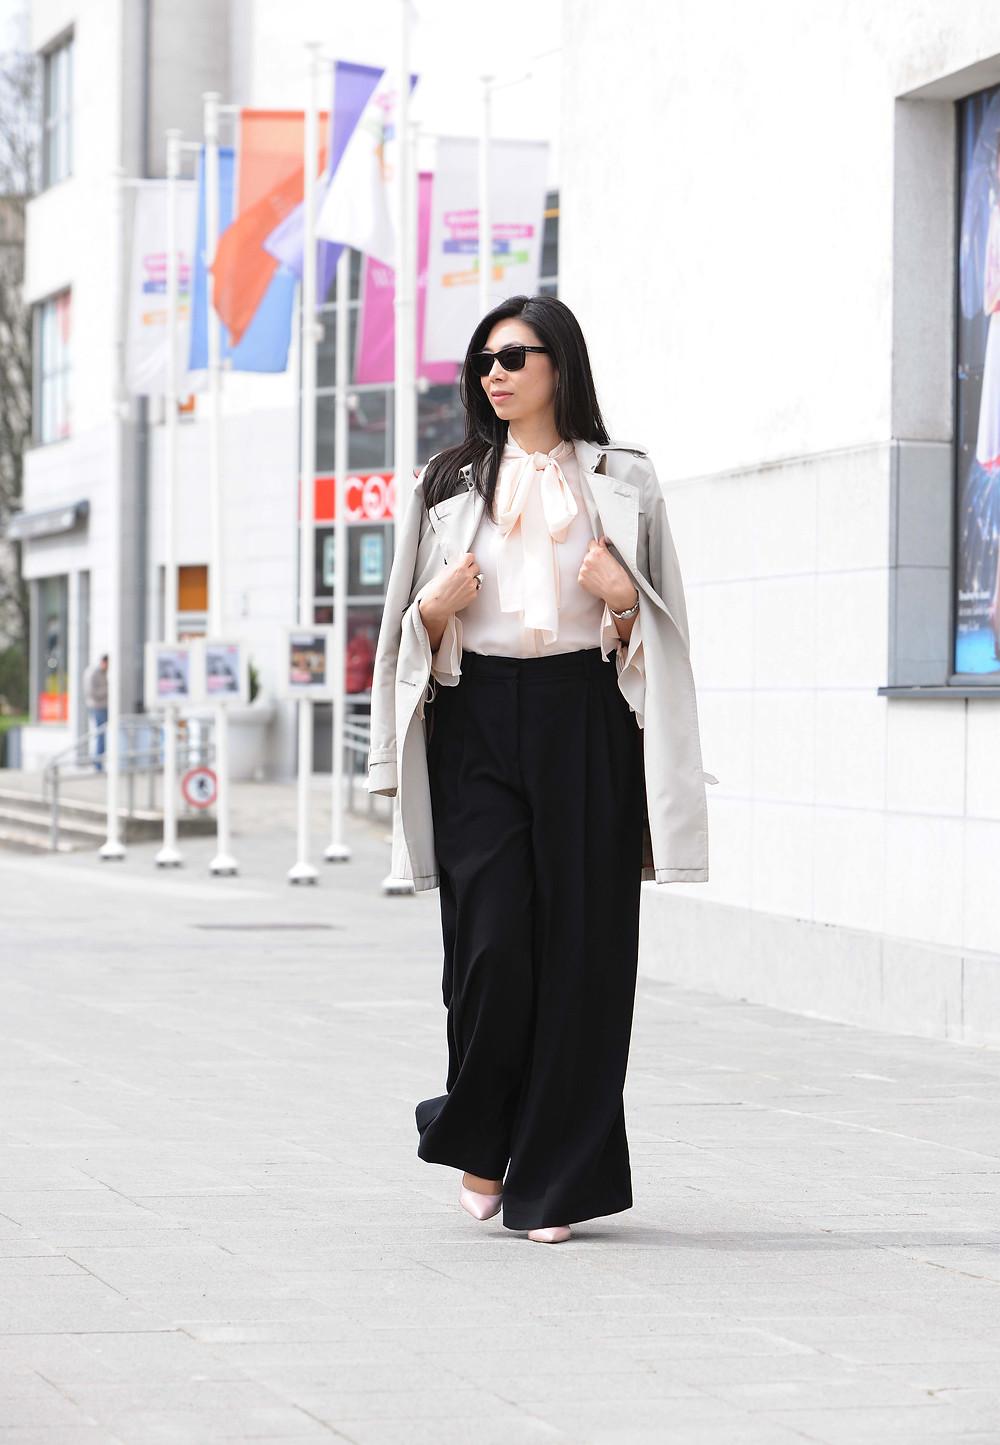 Blush blouse with white pants.